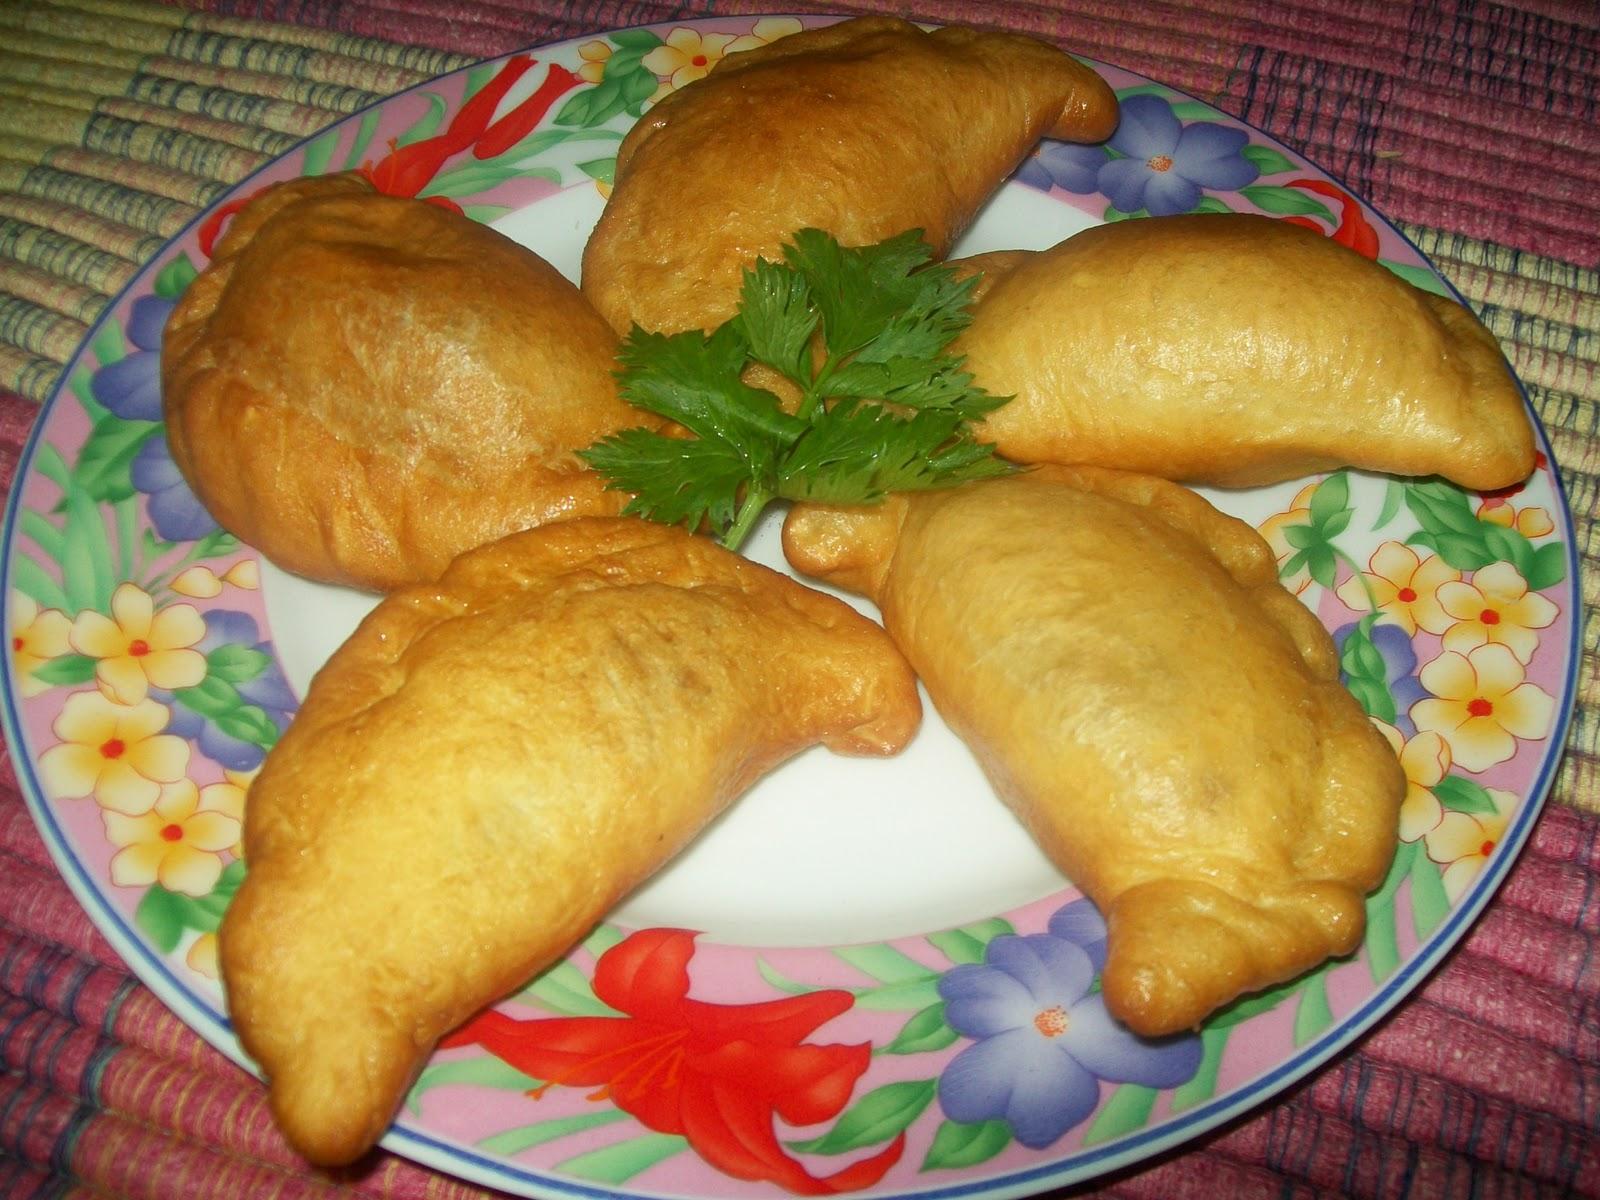 Resep Kue Bangkit Jtt: Resep Masak Kue Panada Dan Cara Membuat Kue PANADA